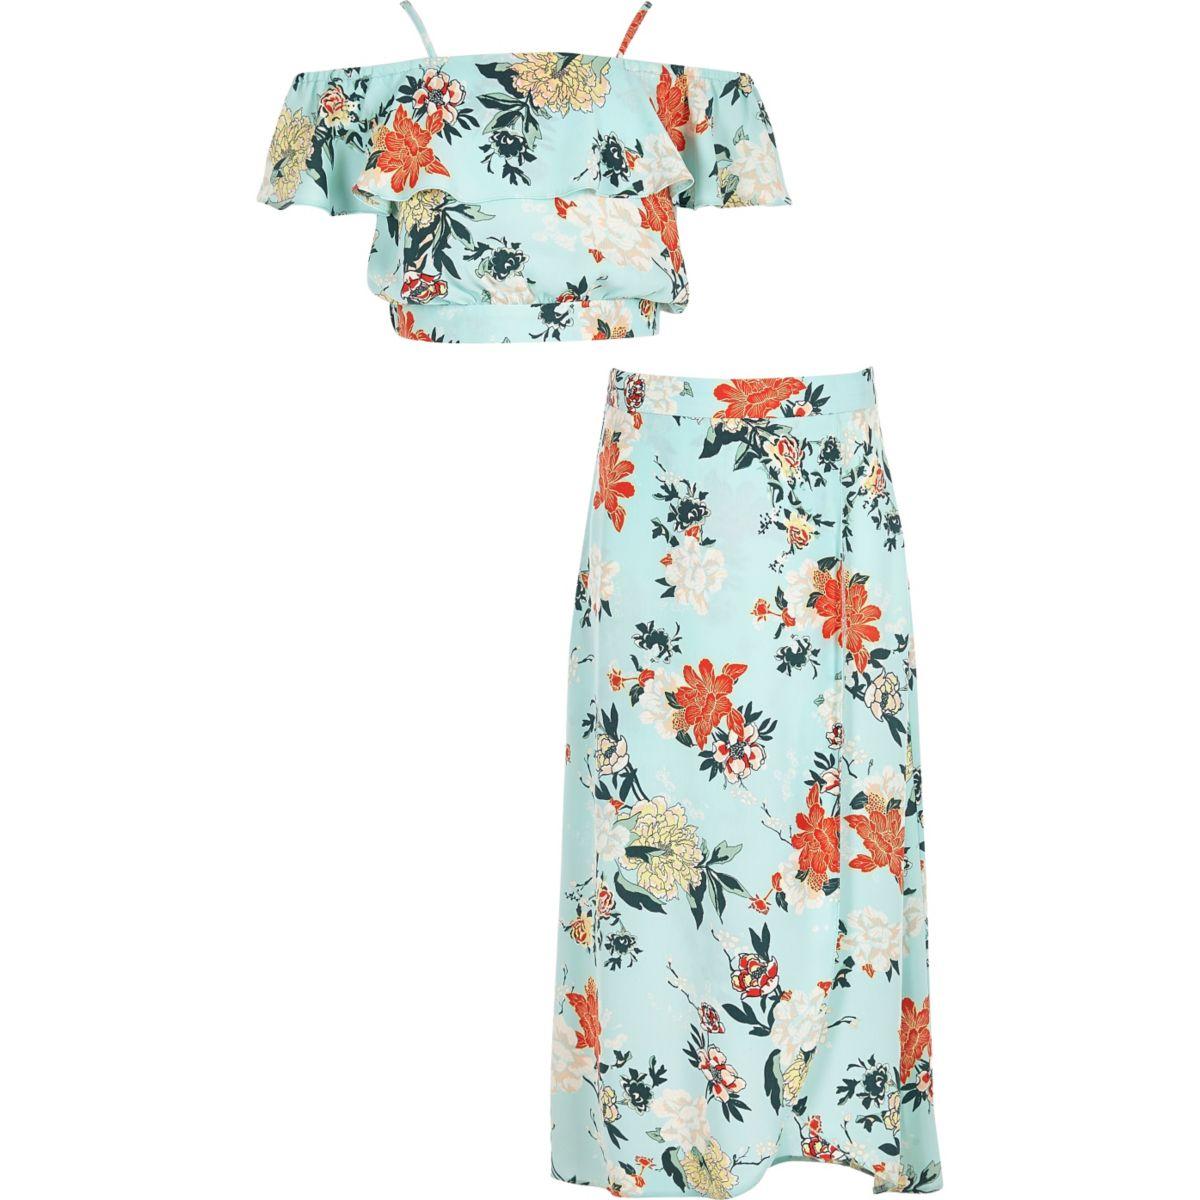 Girls green floral crop top and skirt set